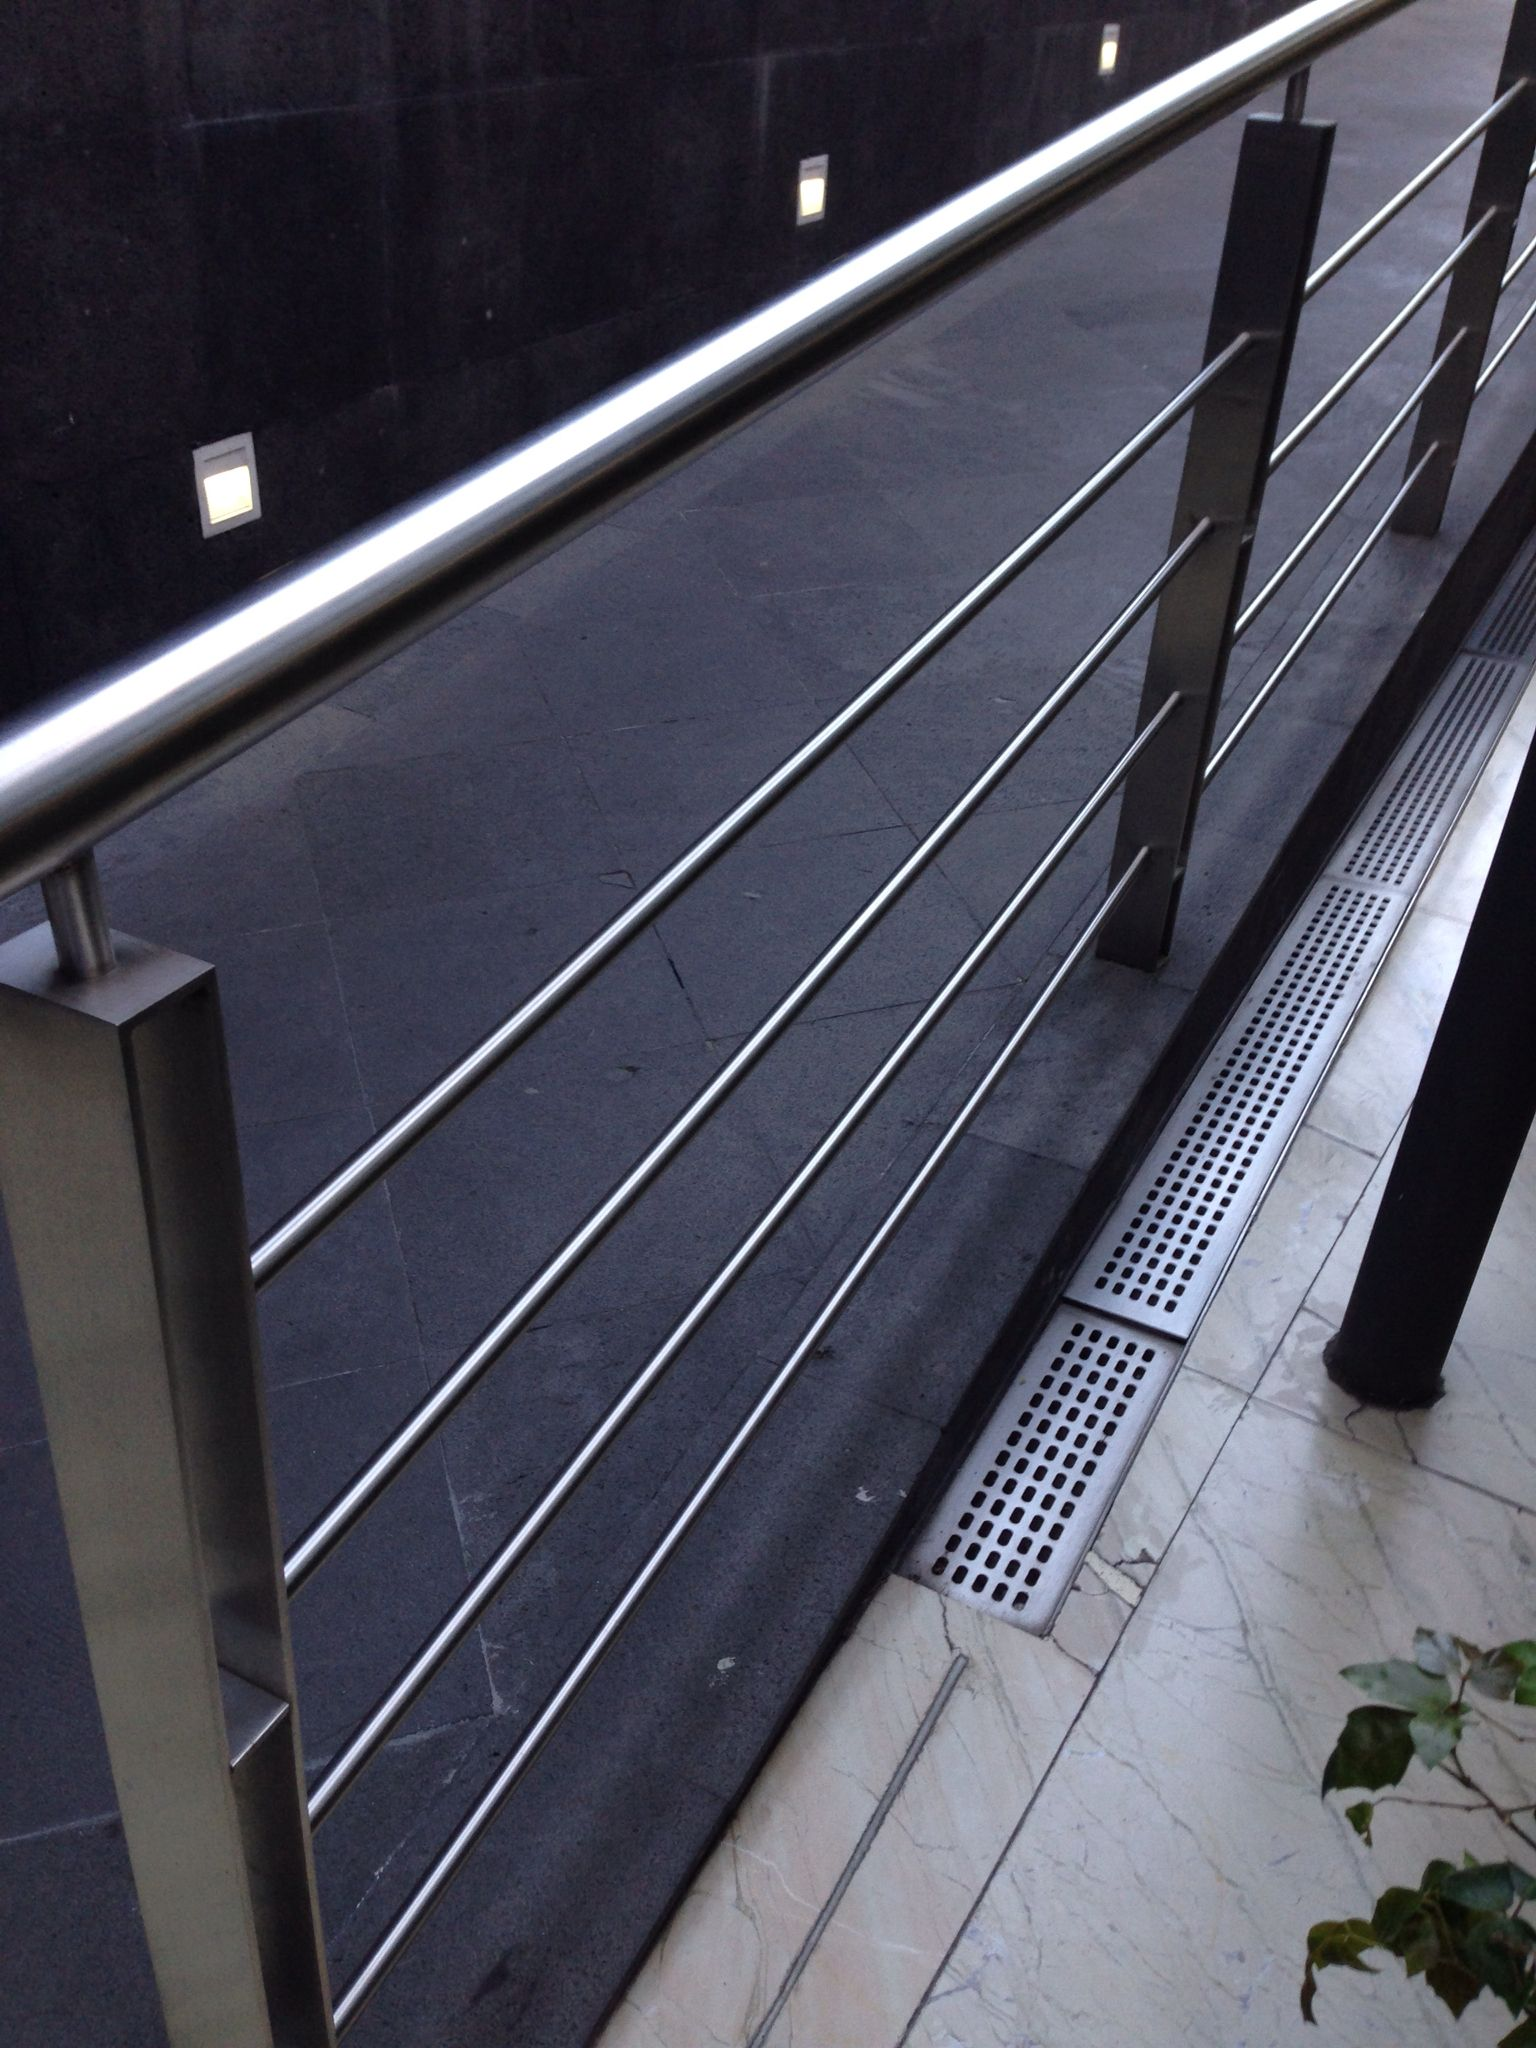 Barandales de acero para exteriores escaleras y barandal for Tipos de escaleras exteriores